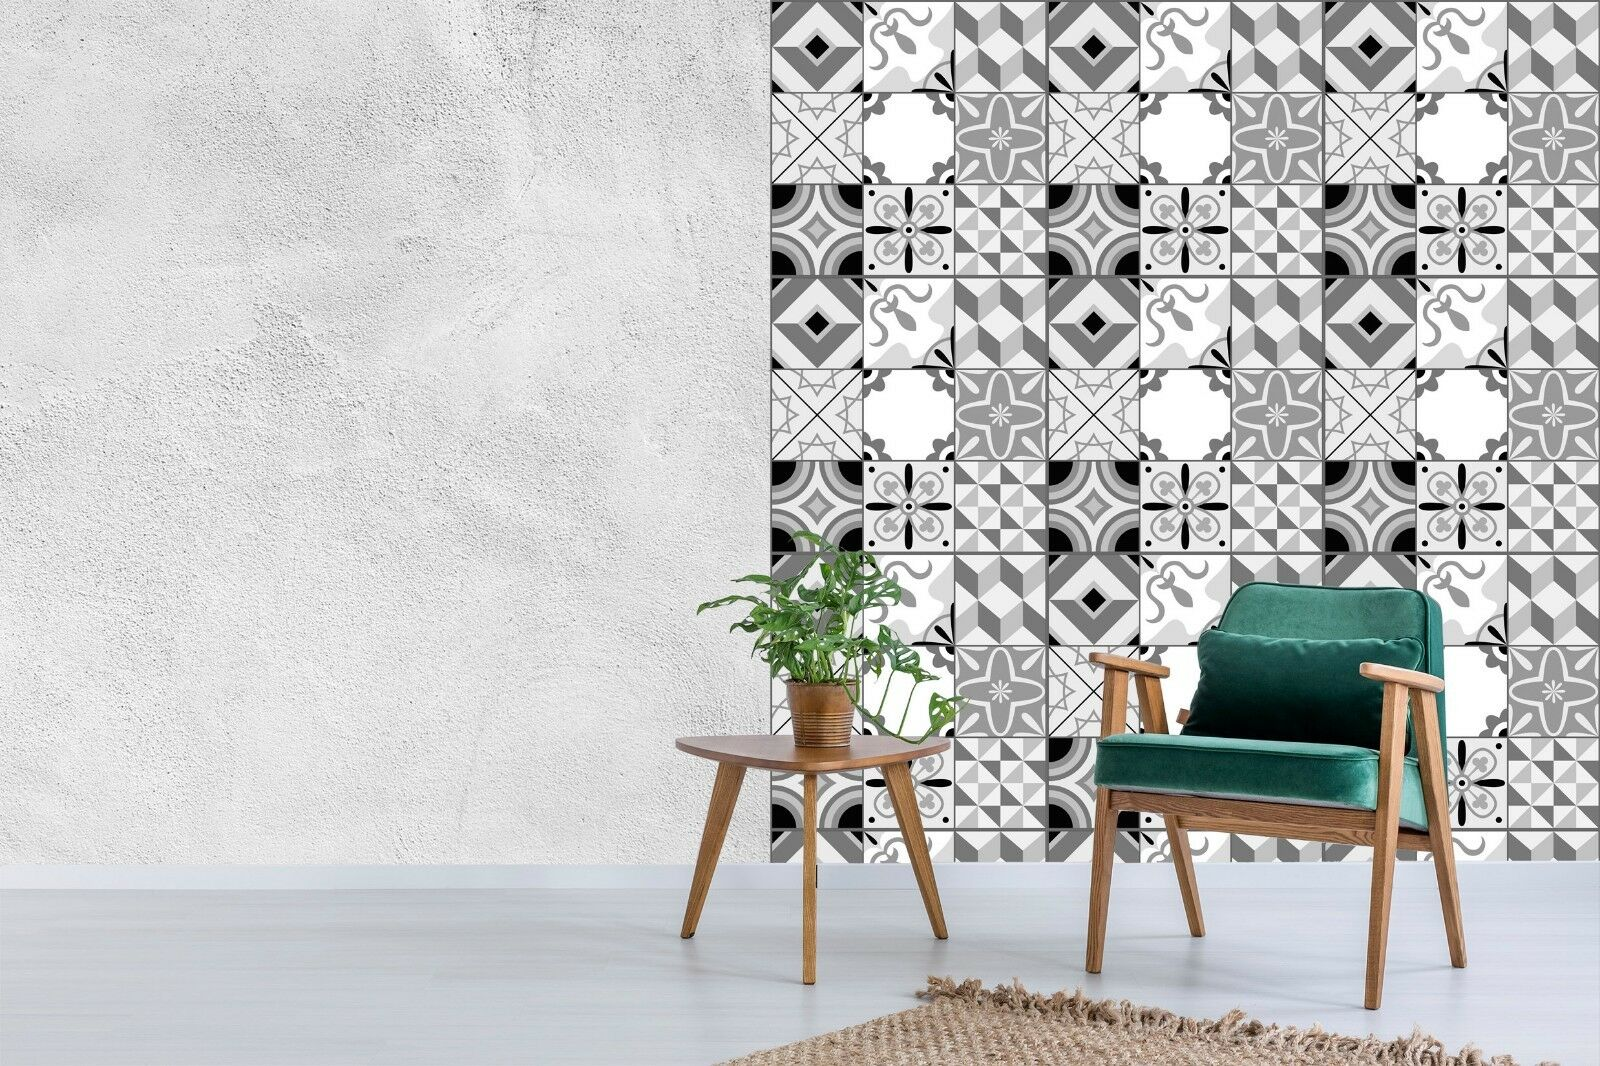 3D grau Pattern 704 Wall Paper Print Wall Decal Deco Indoor Wall Murals US